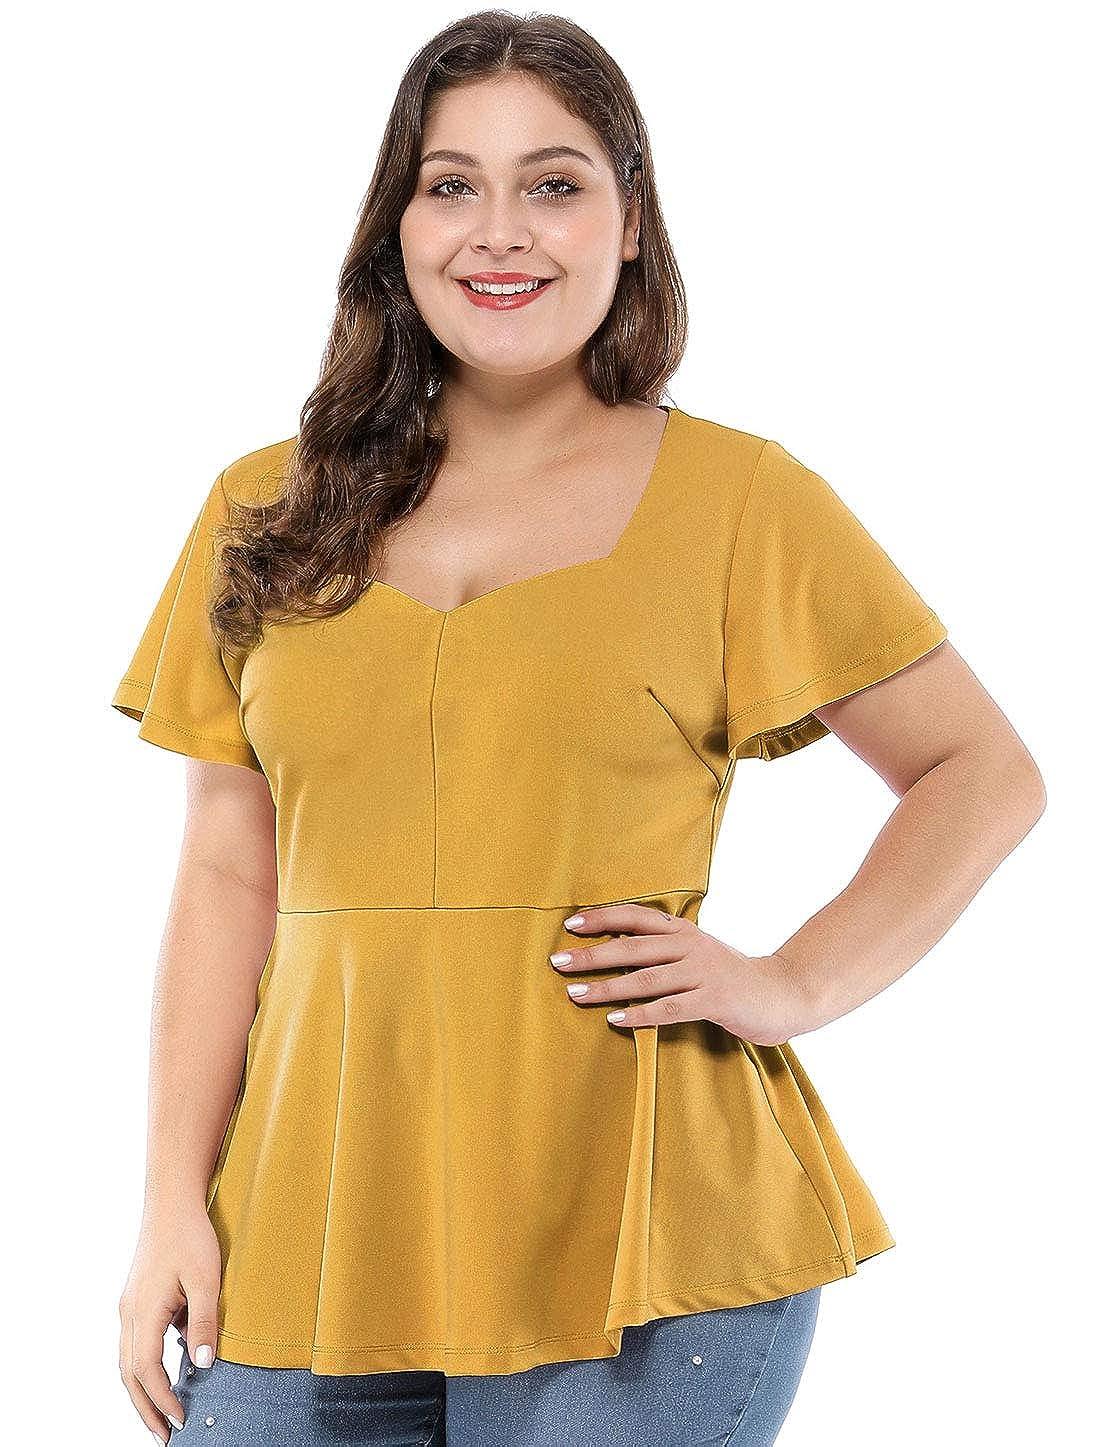 60d3e212 Agnes Orinda Women's Plus Size Ruffle Sleeves Sweetheart Peplum Top:  Amazon.ca: Clothing & Accessories